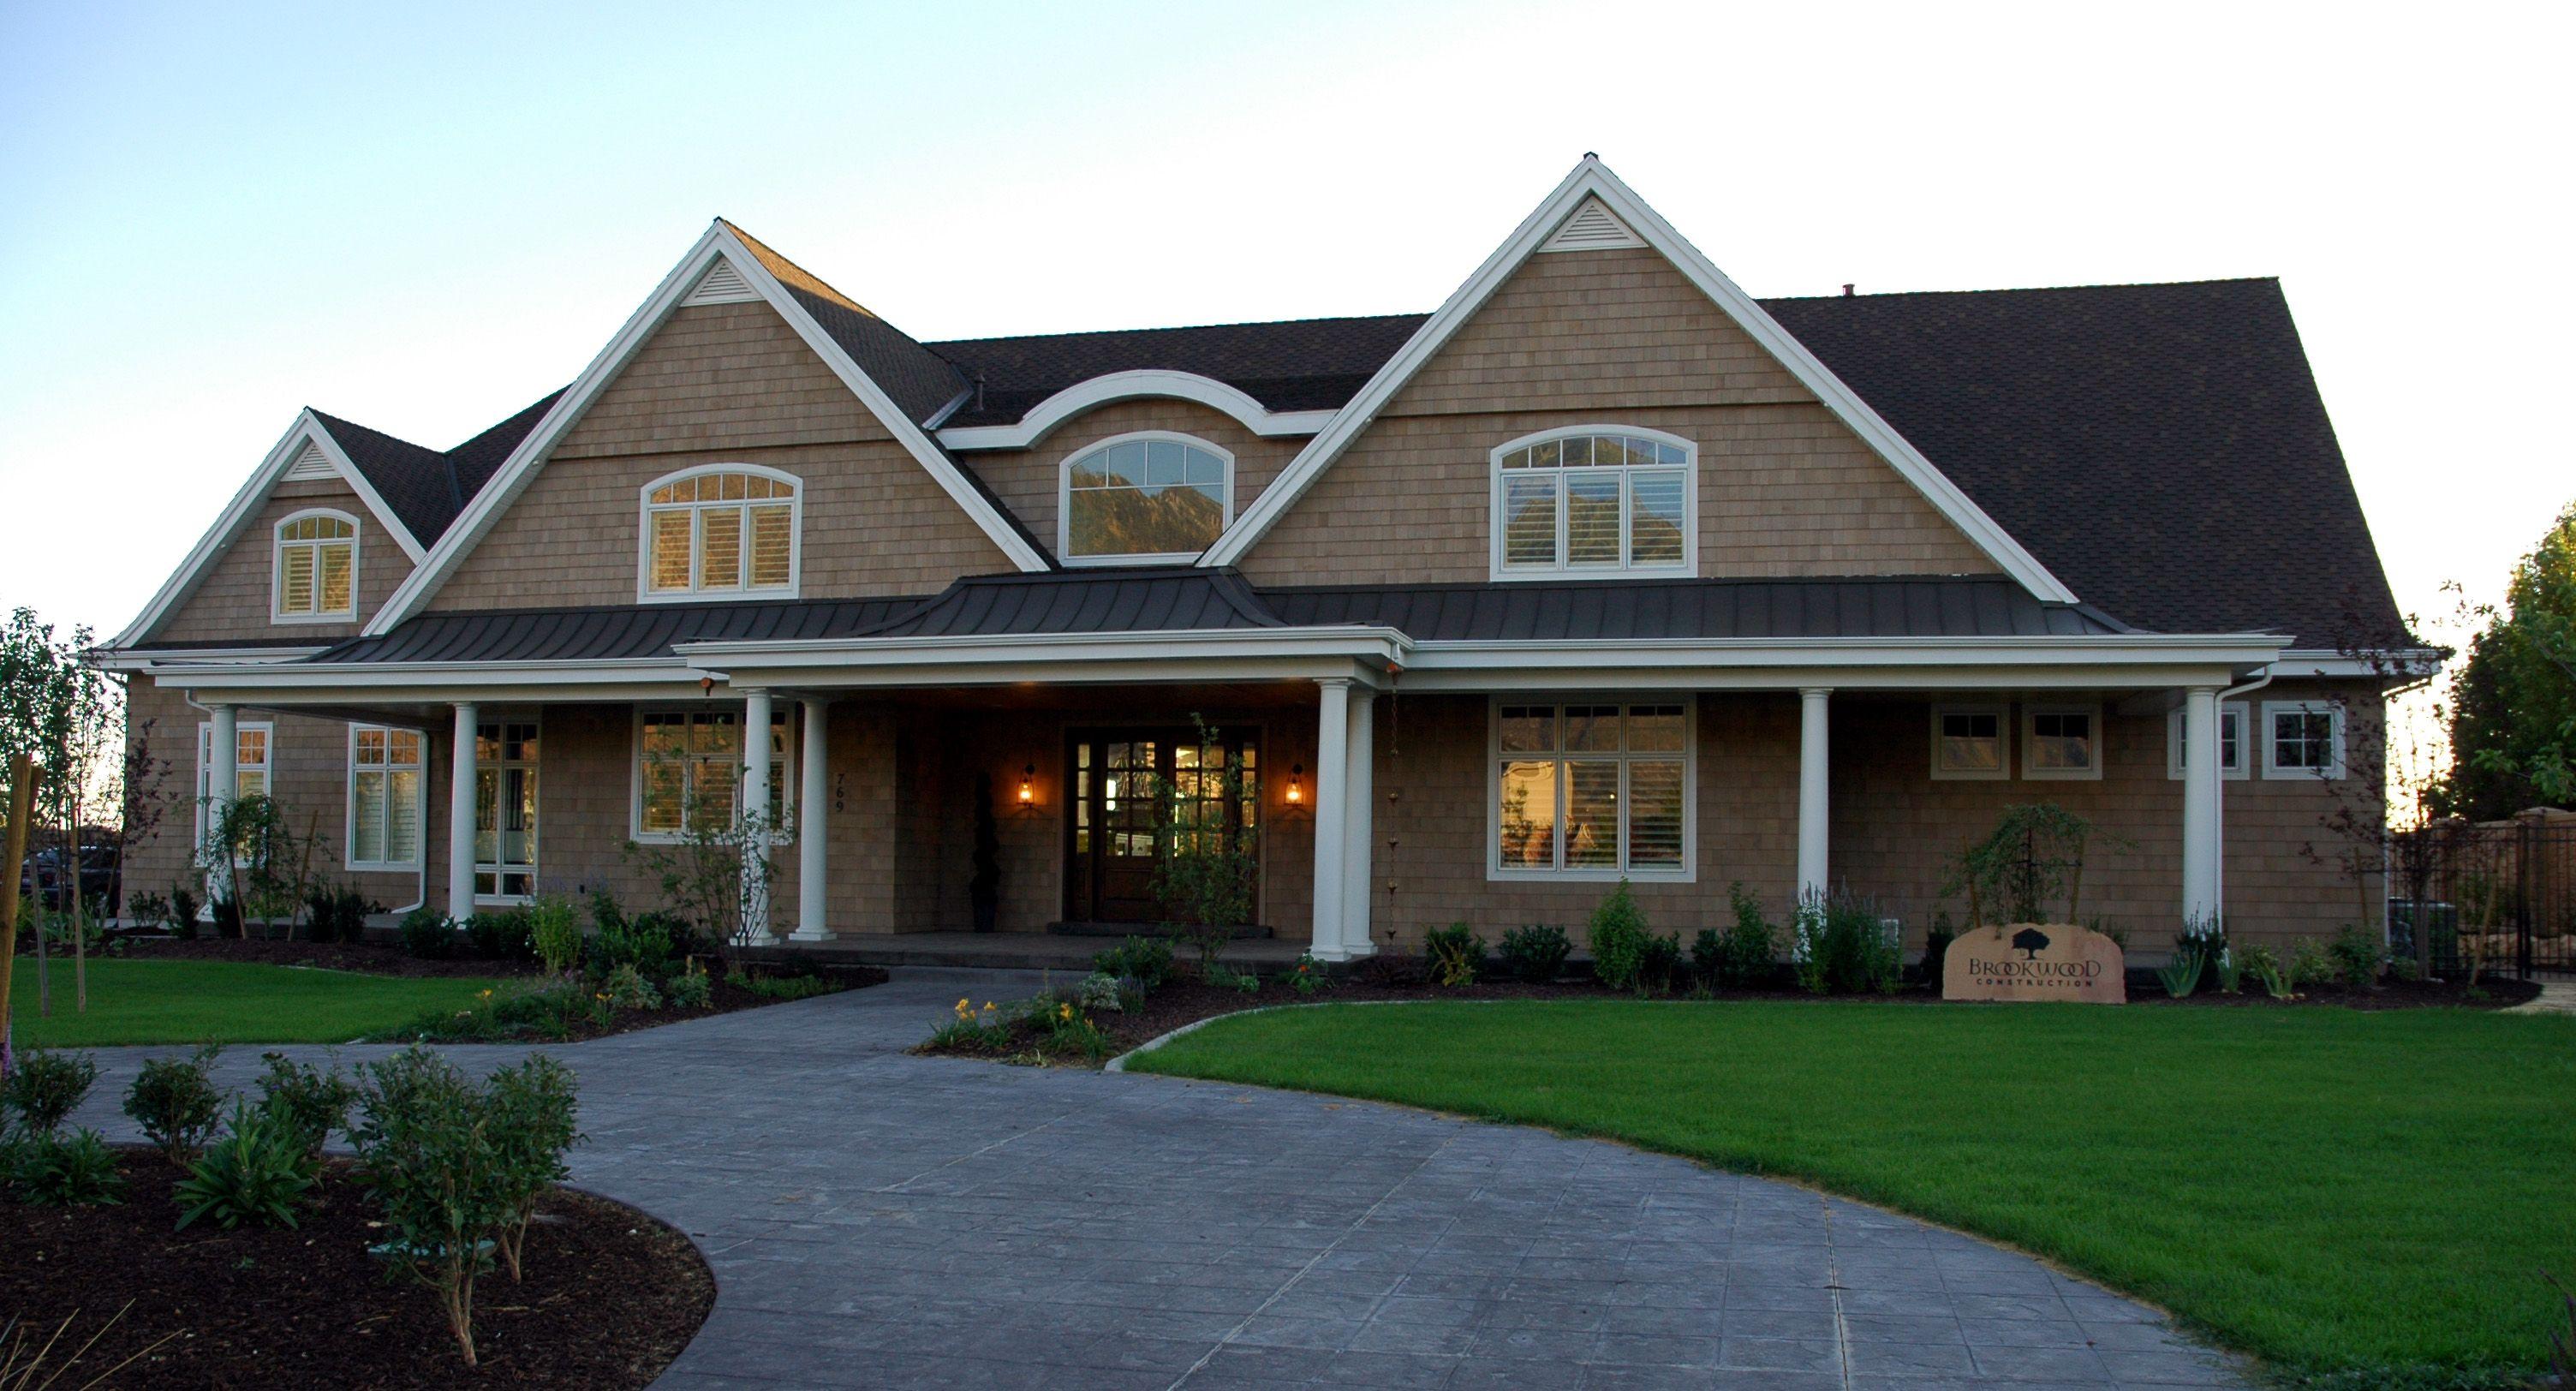 ICYMI: Custom Home Designers Houston Texas | hiqra | Pinterest